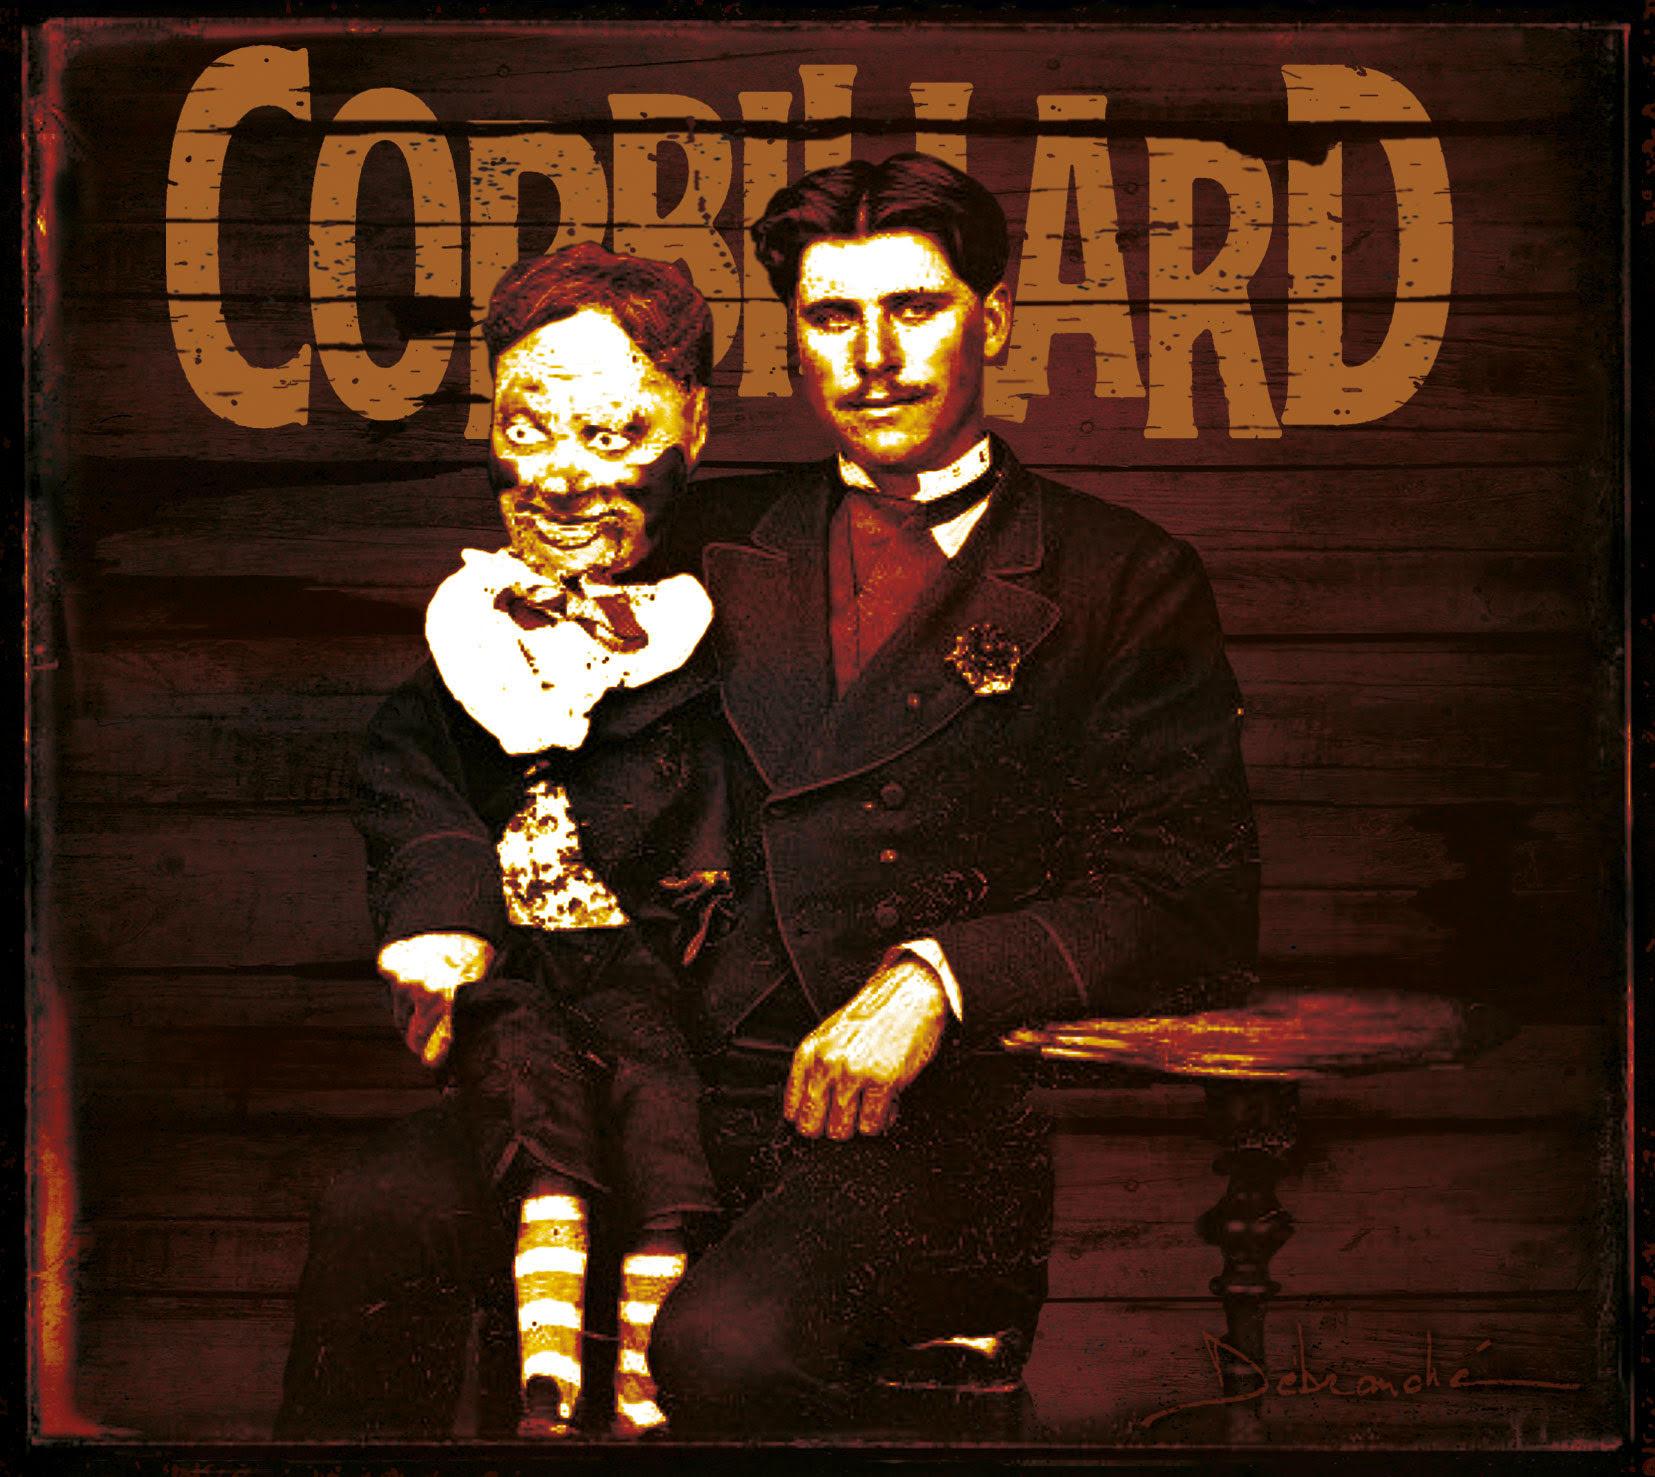 Corbillard - Album artwork